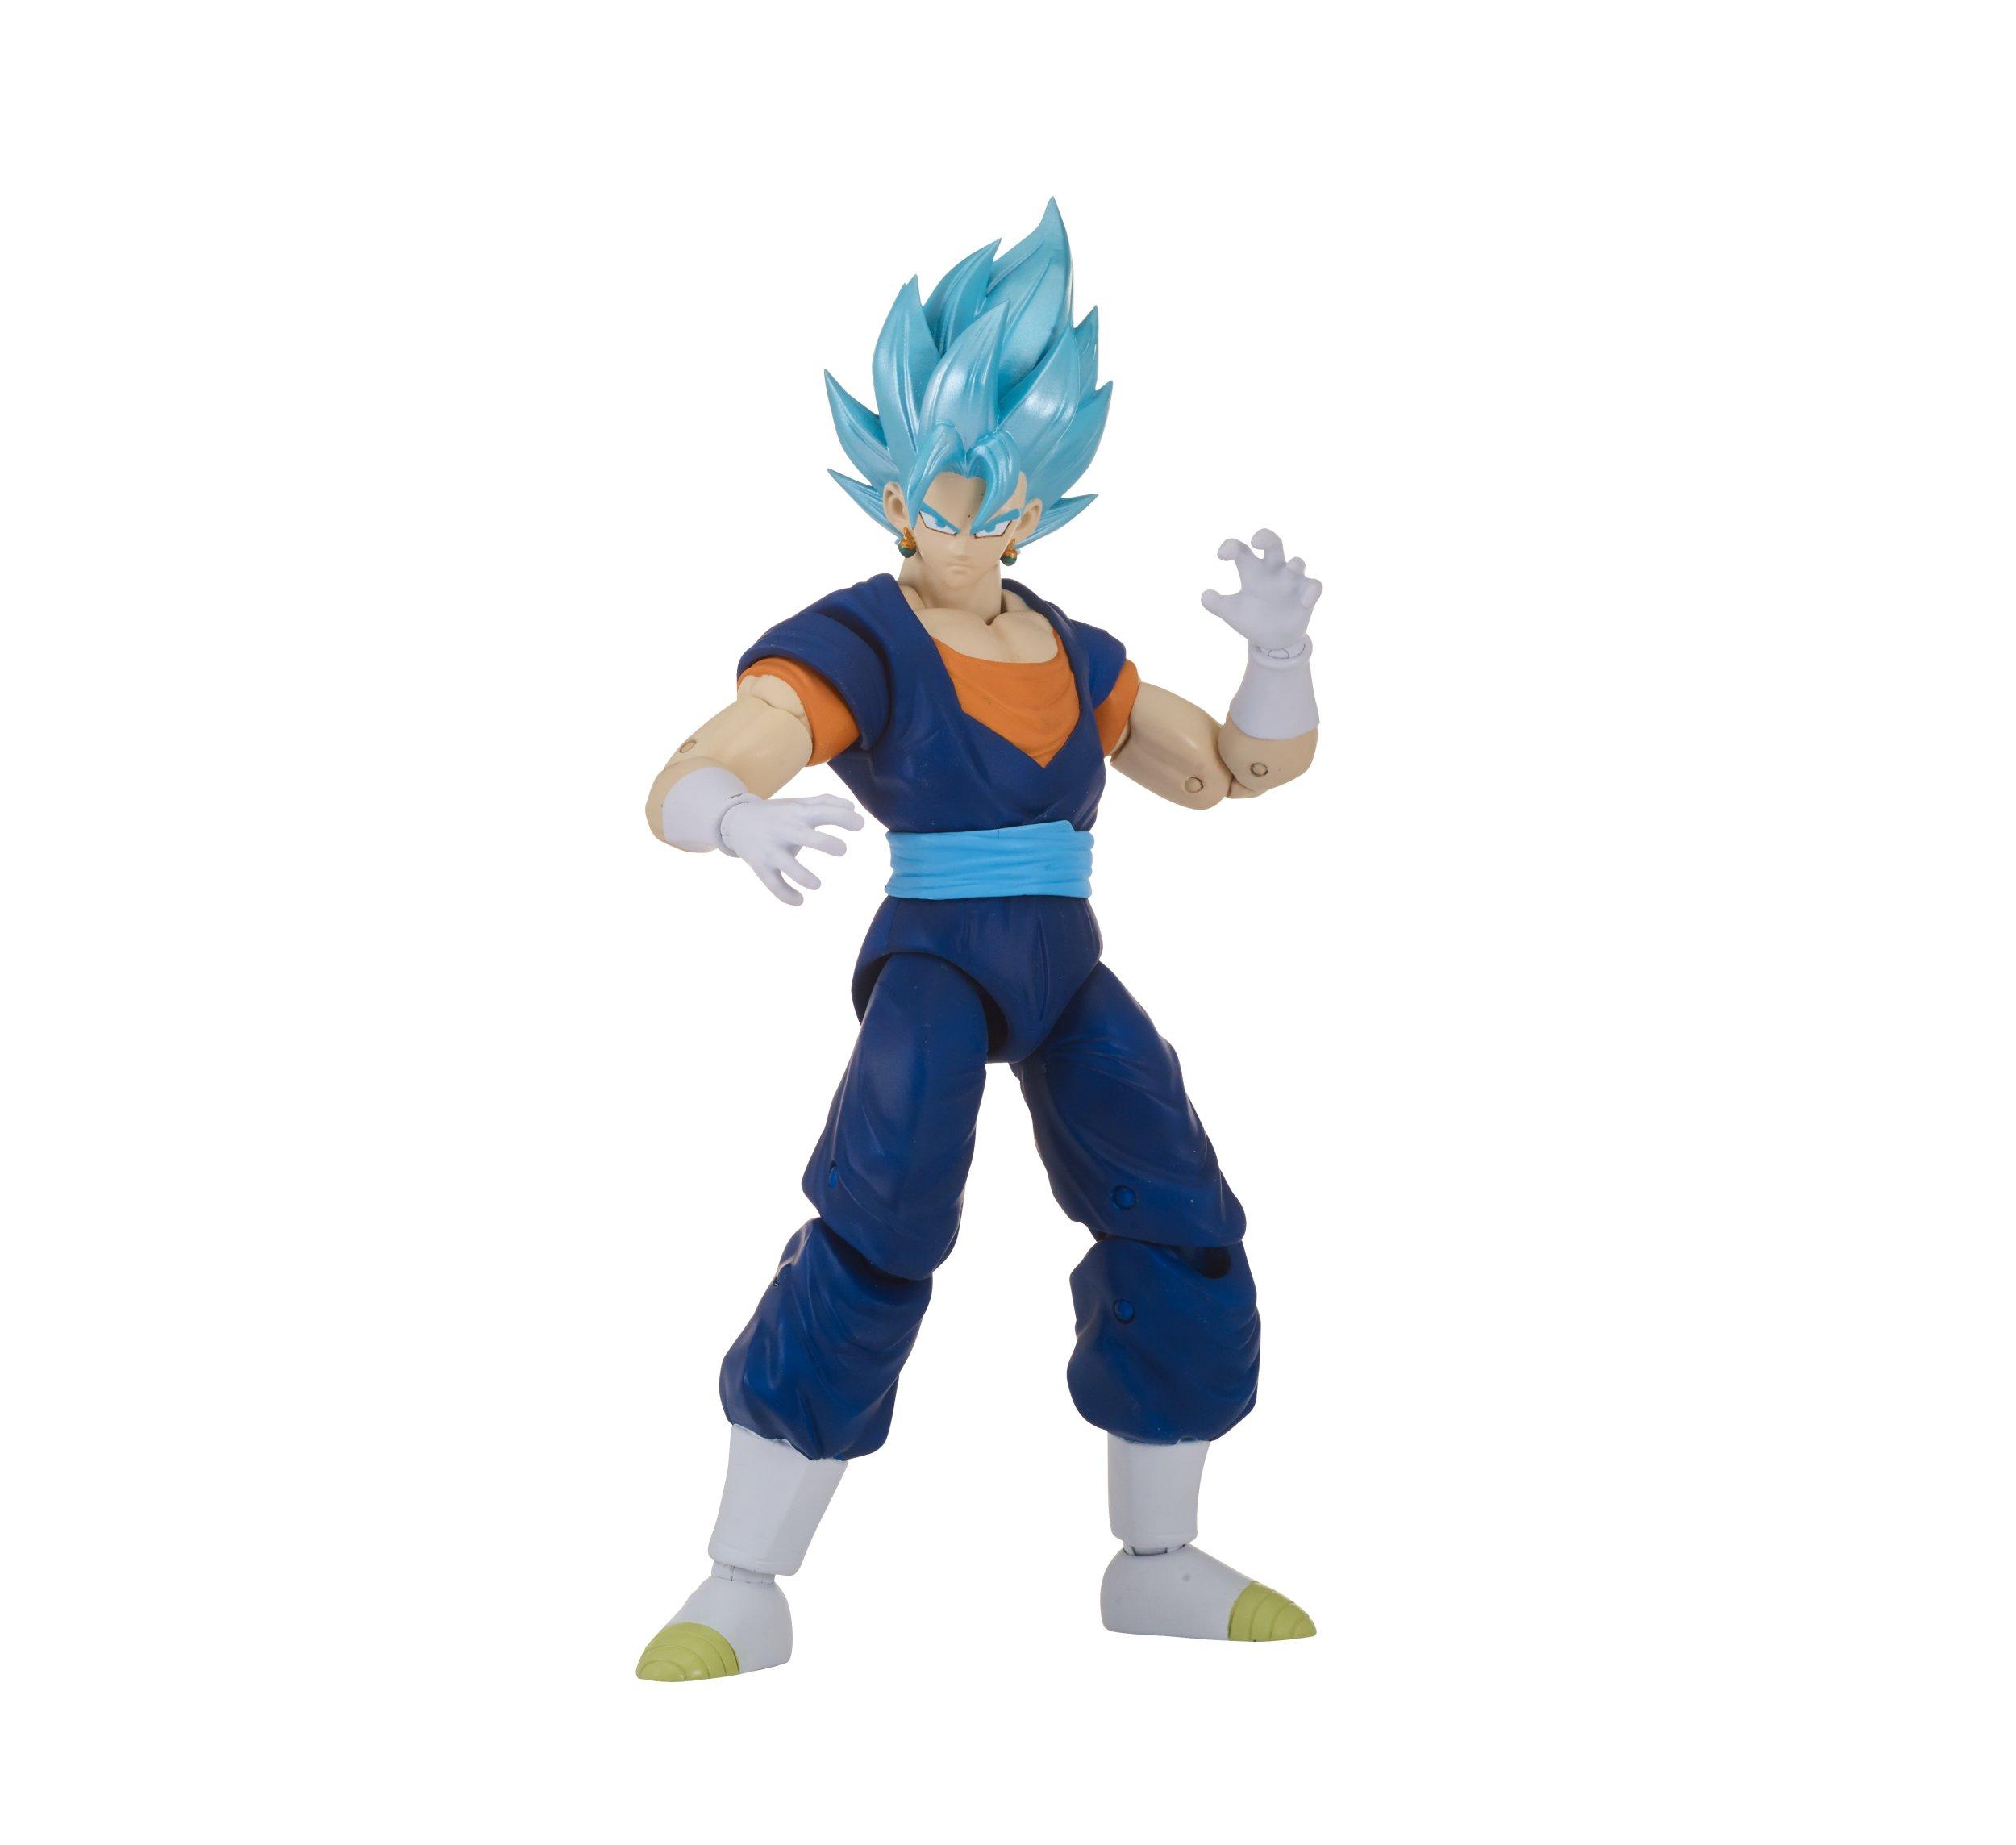 Dragon Stars Collector Value Pack: Super Saiyan Blue Vegito(x2), Super Saiyan Cabba(x2), Jiren(x2) set